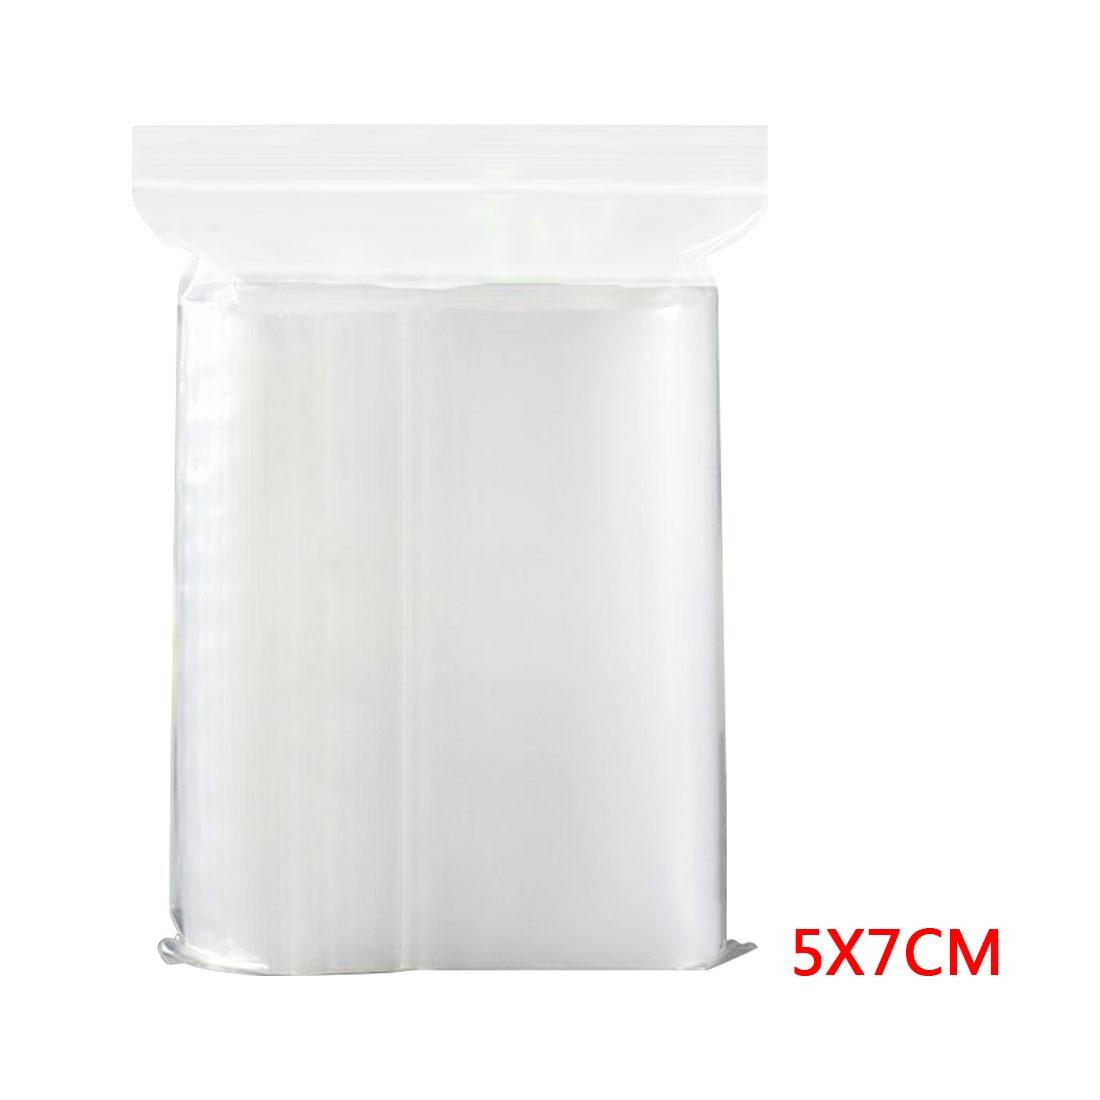 Best 100 Pcs Plastic Bags White Grip Self Press Seal Resealable Zip Lock